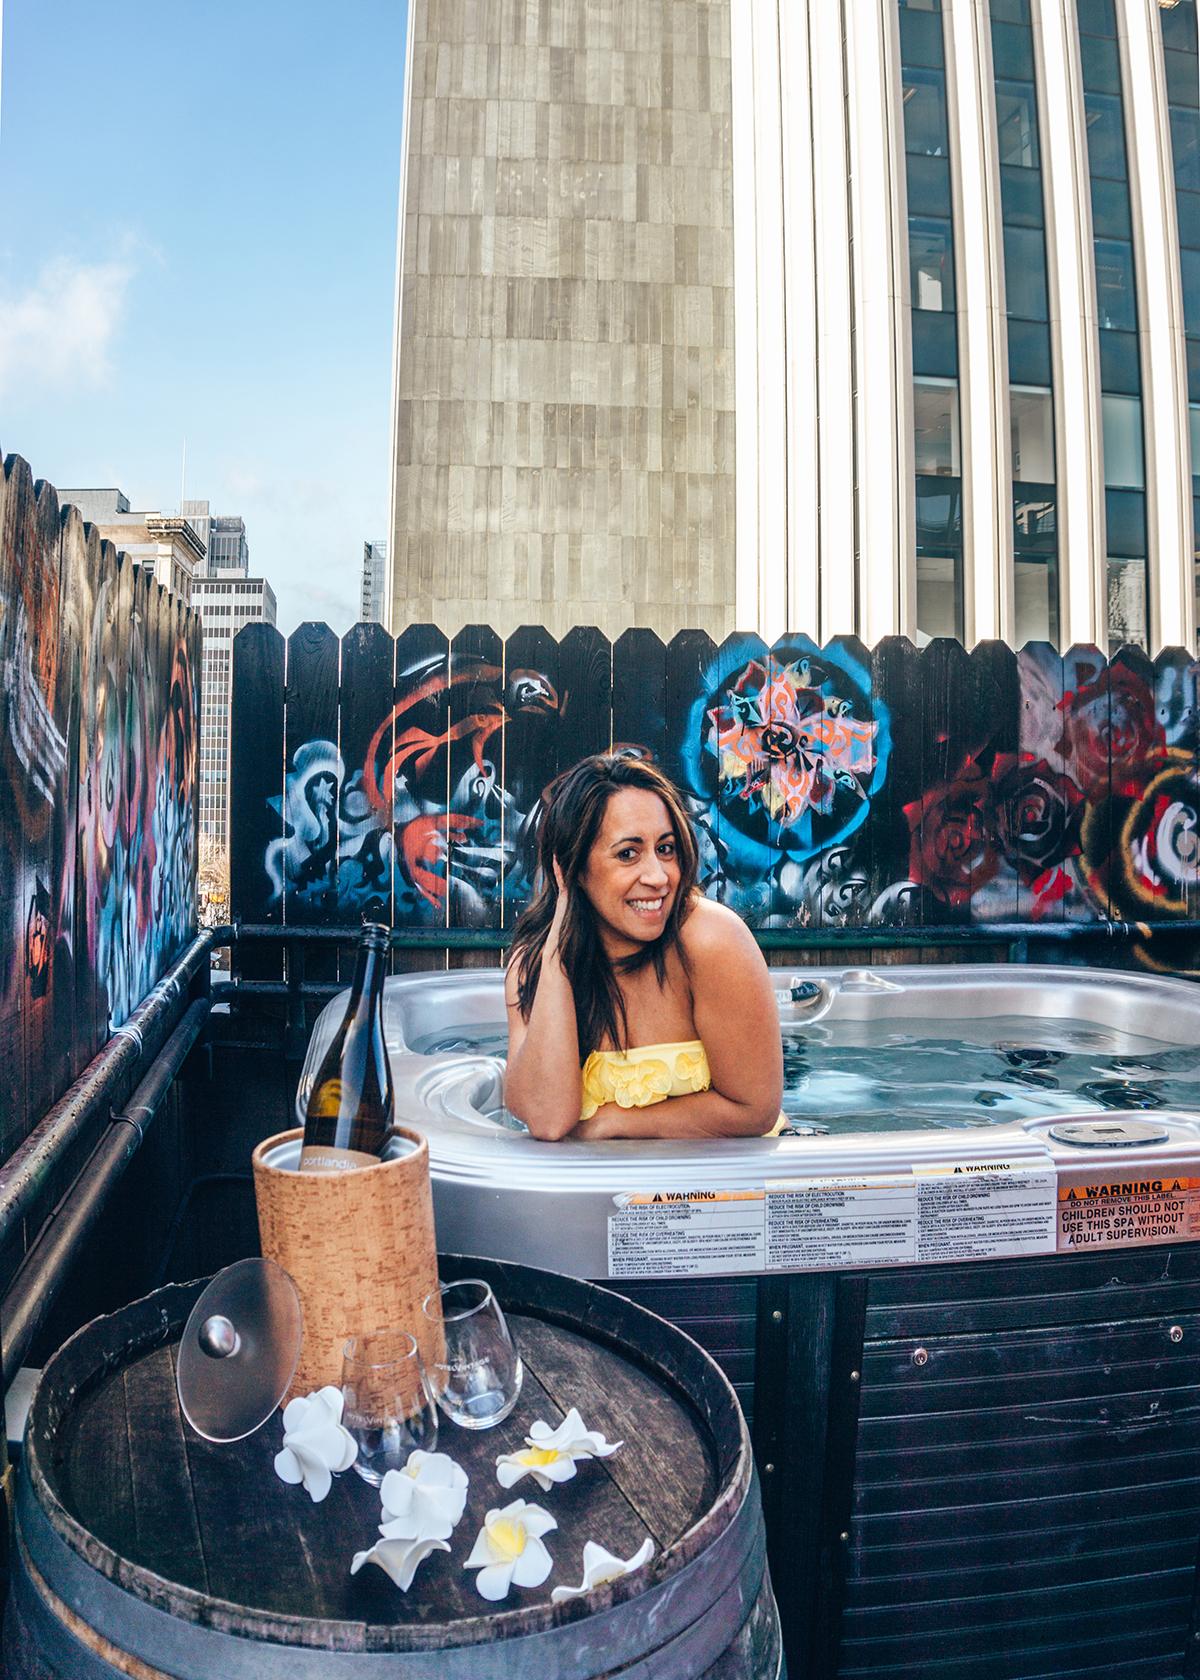 Hotel Vintage rooftop hot tub